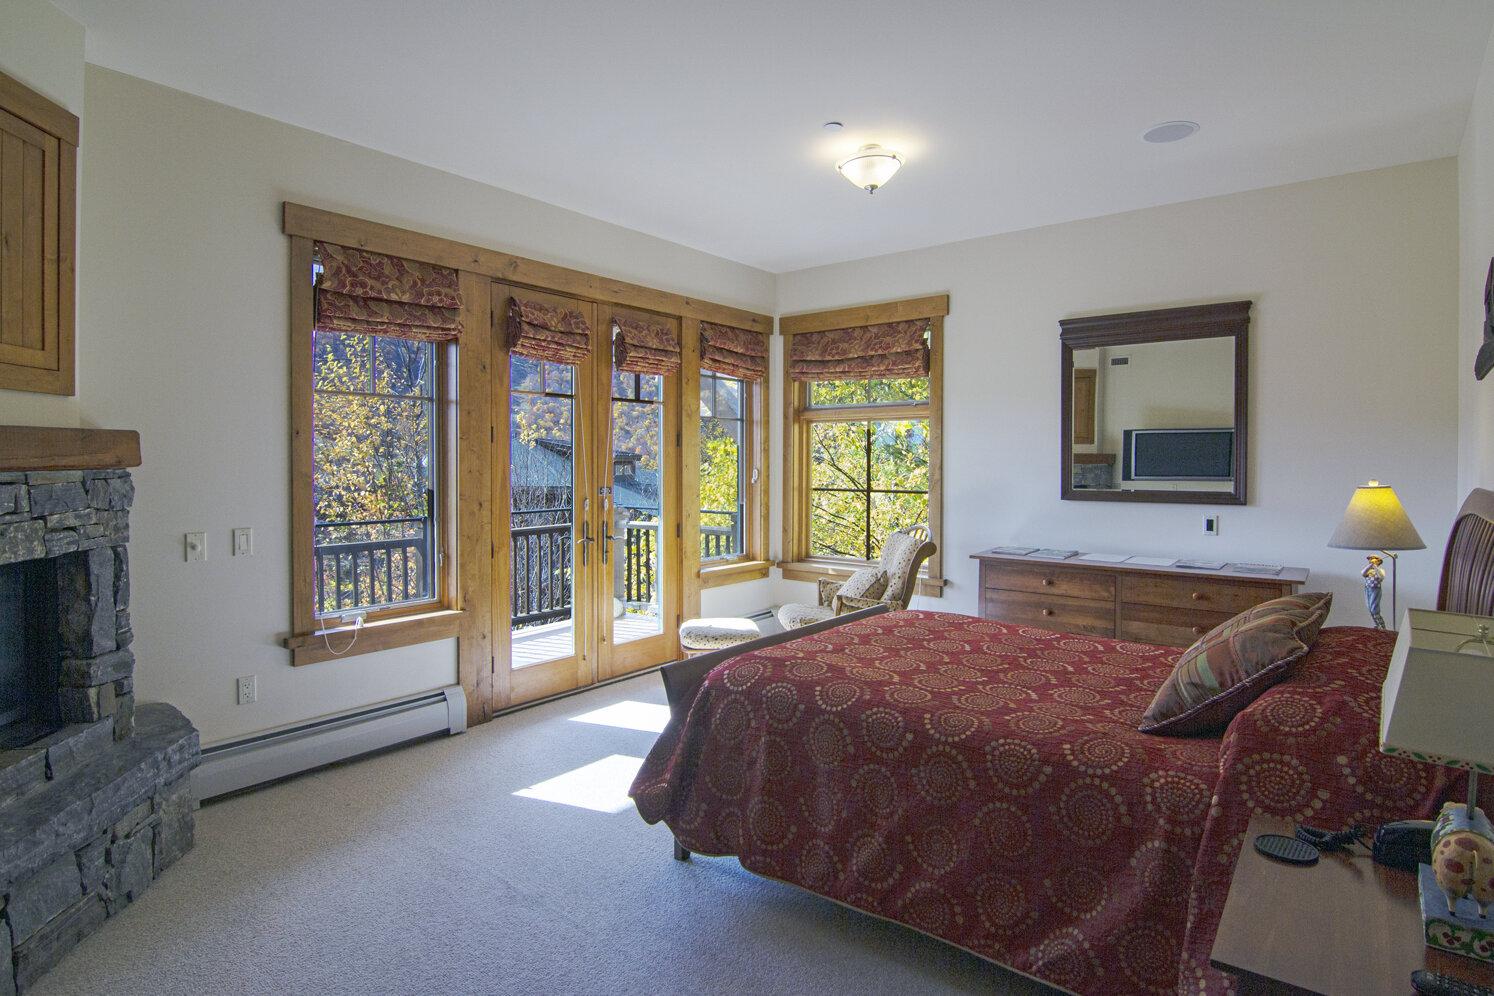 10-2019-10-15 IMG_5262 2nd Master Bedroom_DxOVP.jpg